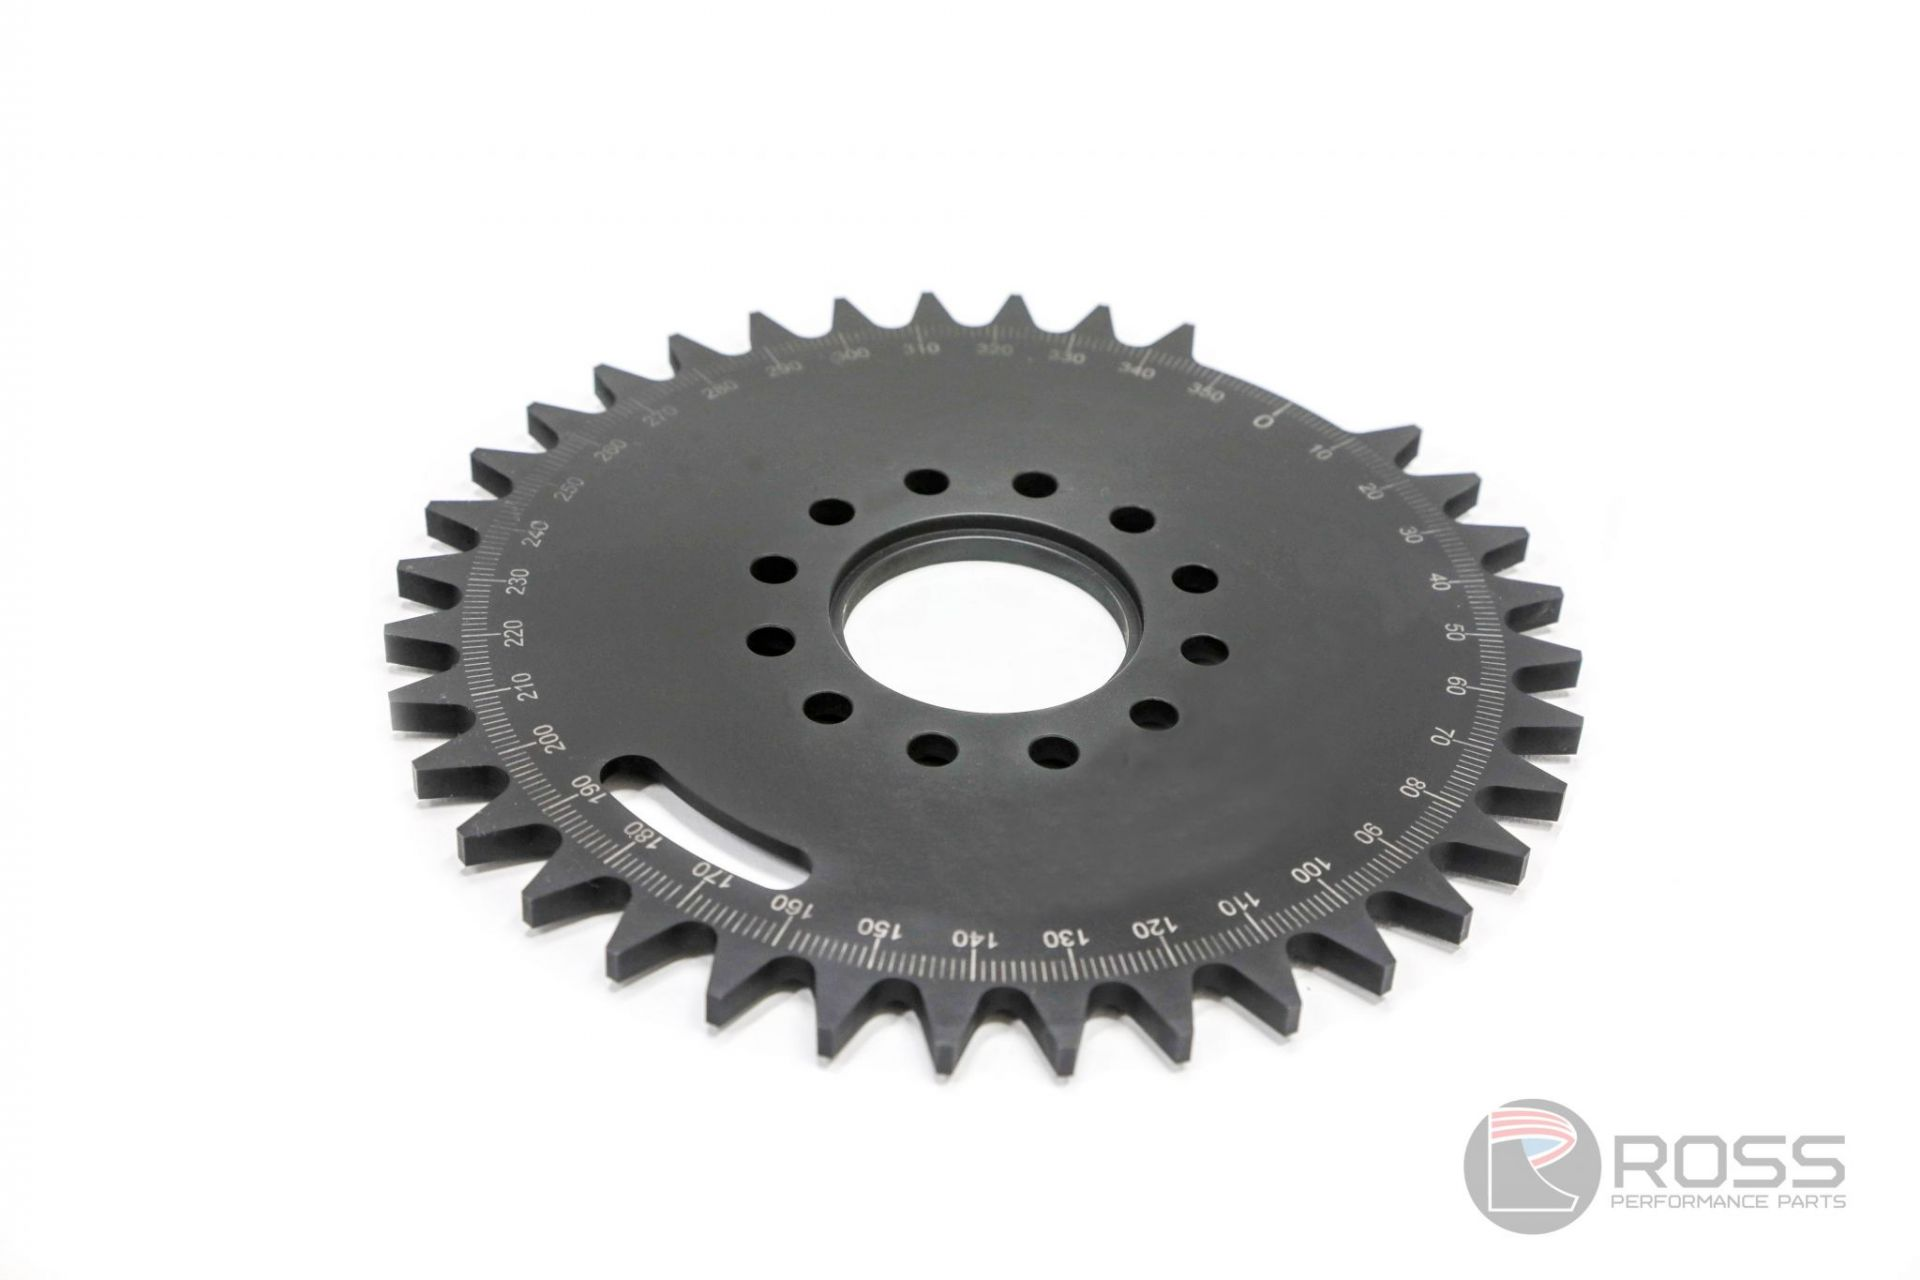 306020-72-36T Nissan VG30 Z32 36-2T Crank Trigger Disc - Ross